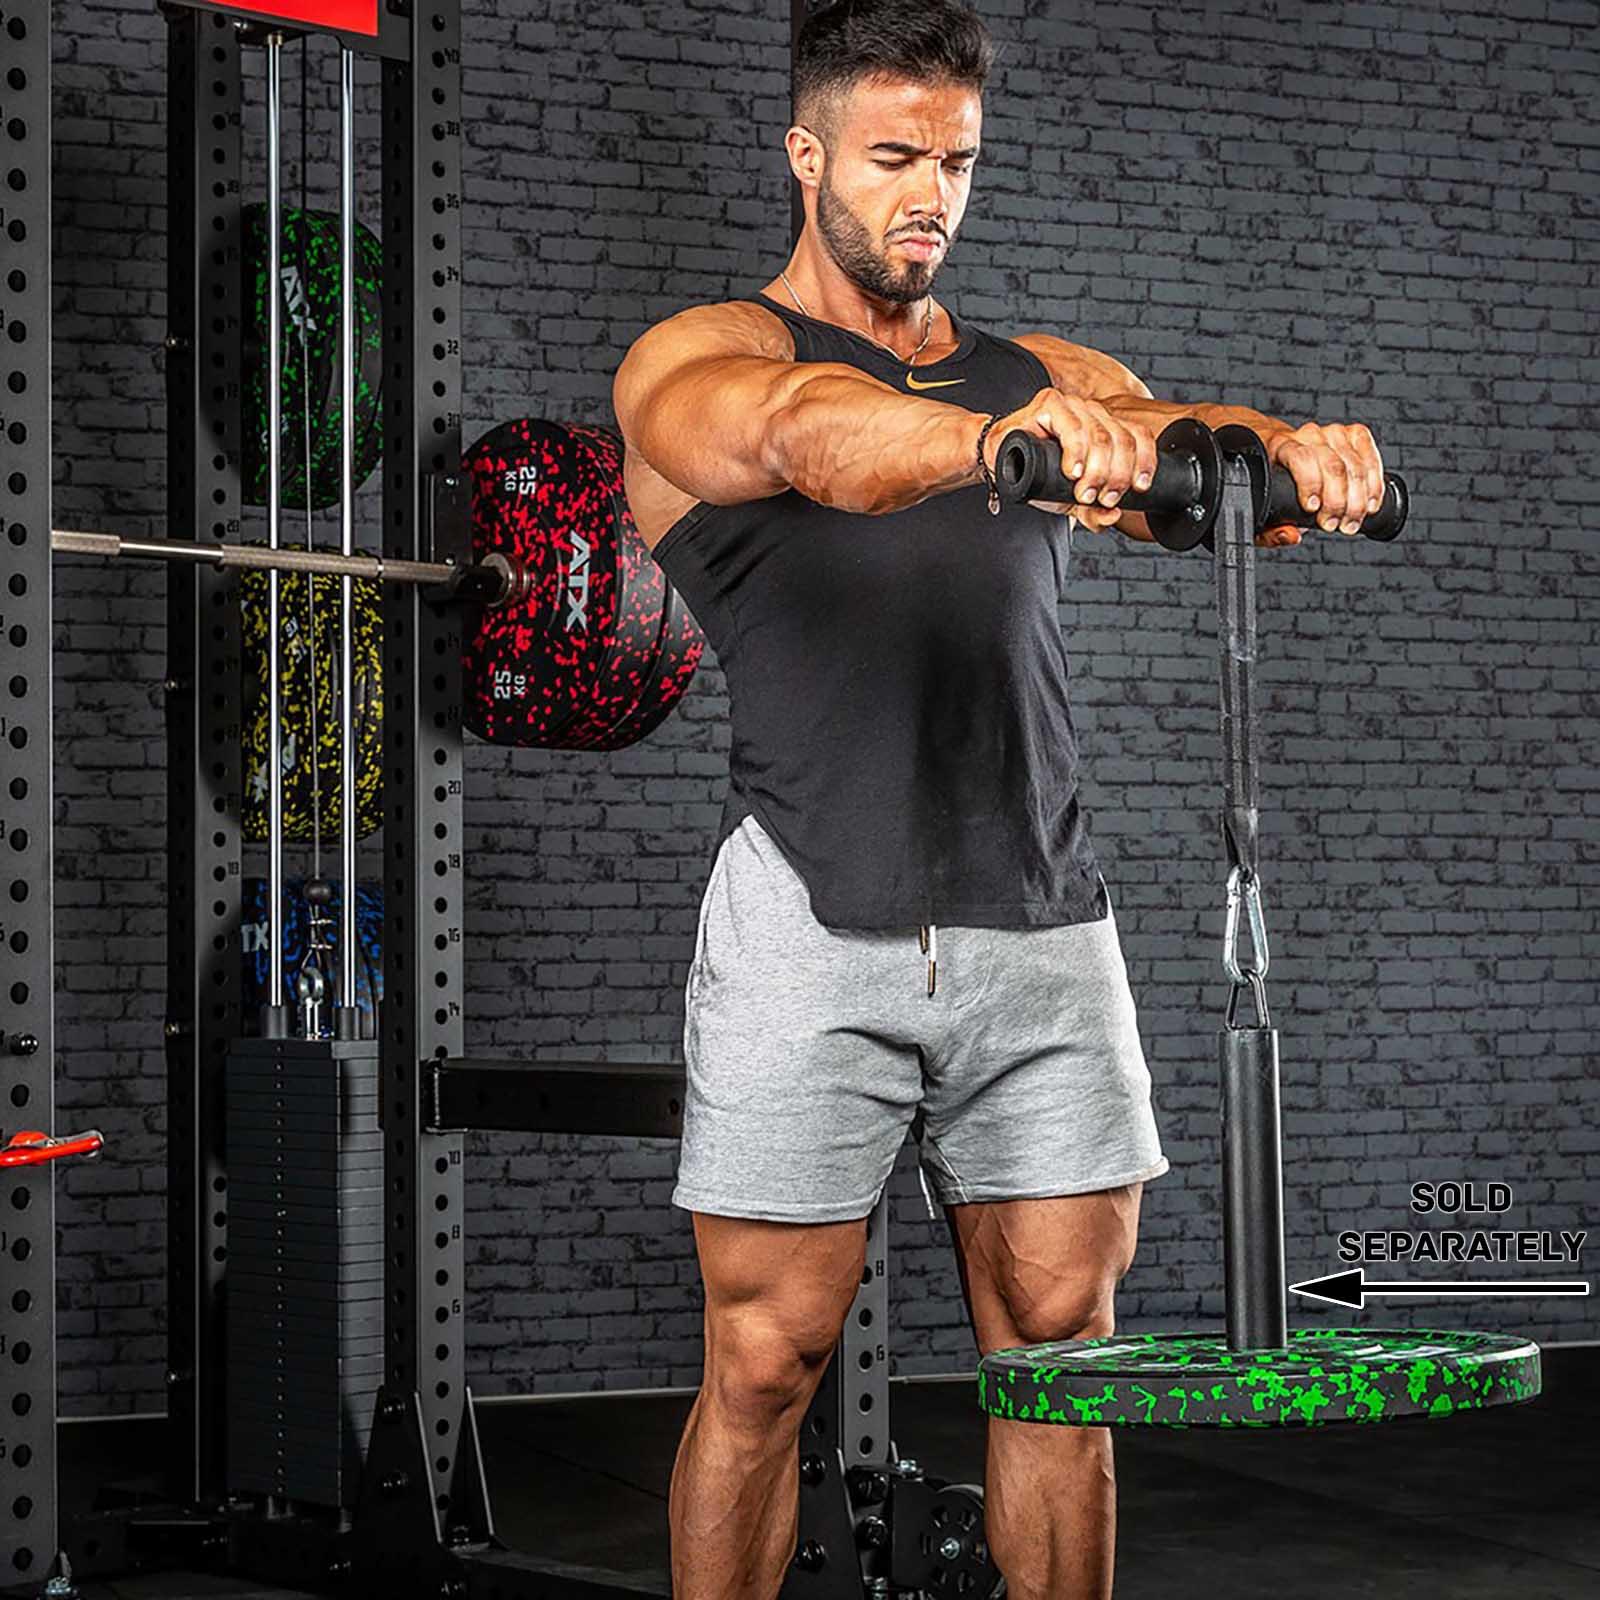 atx-forearm trainer